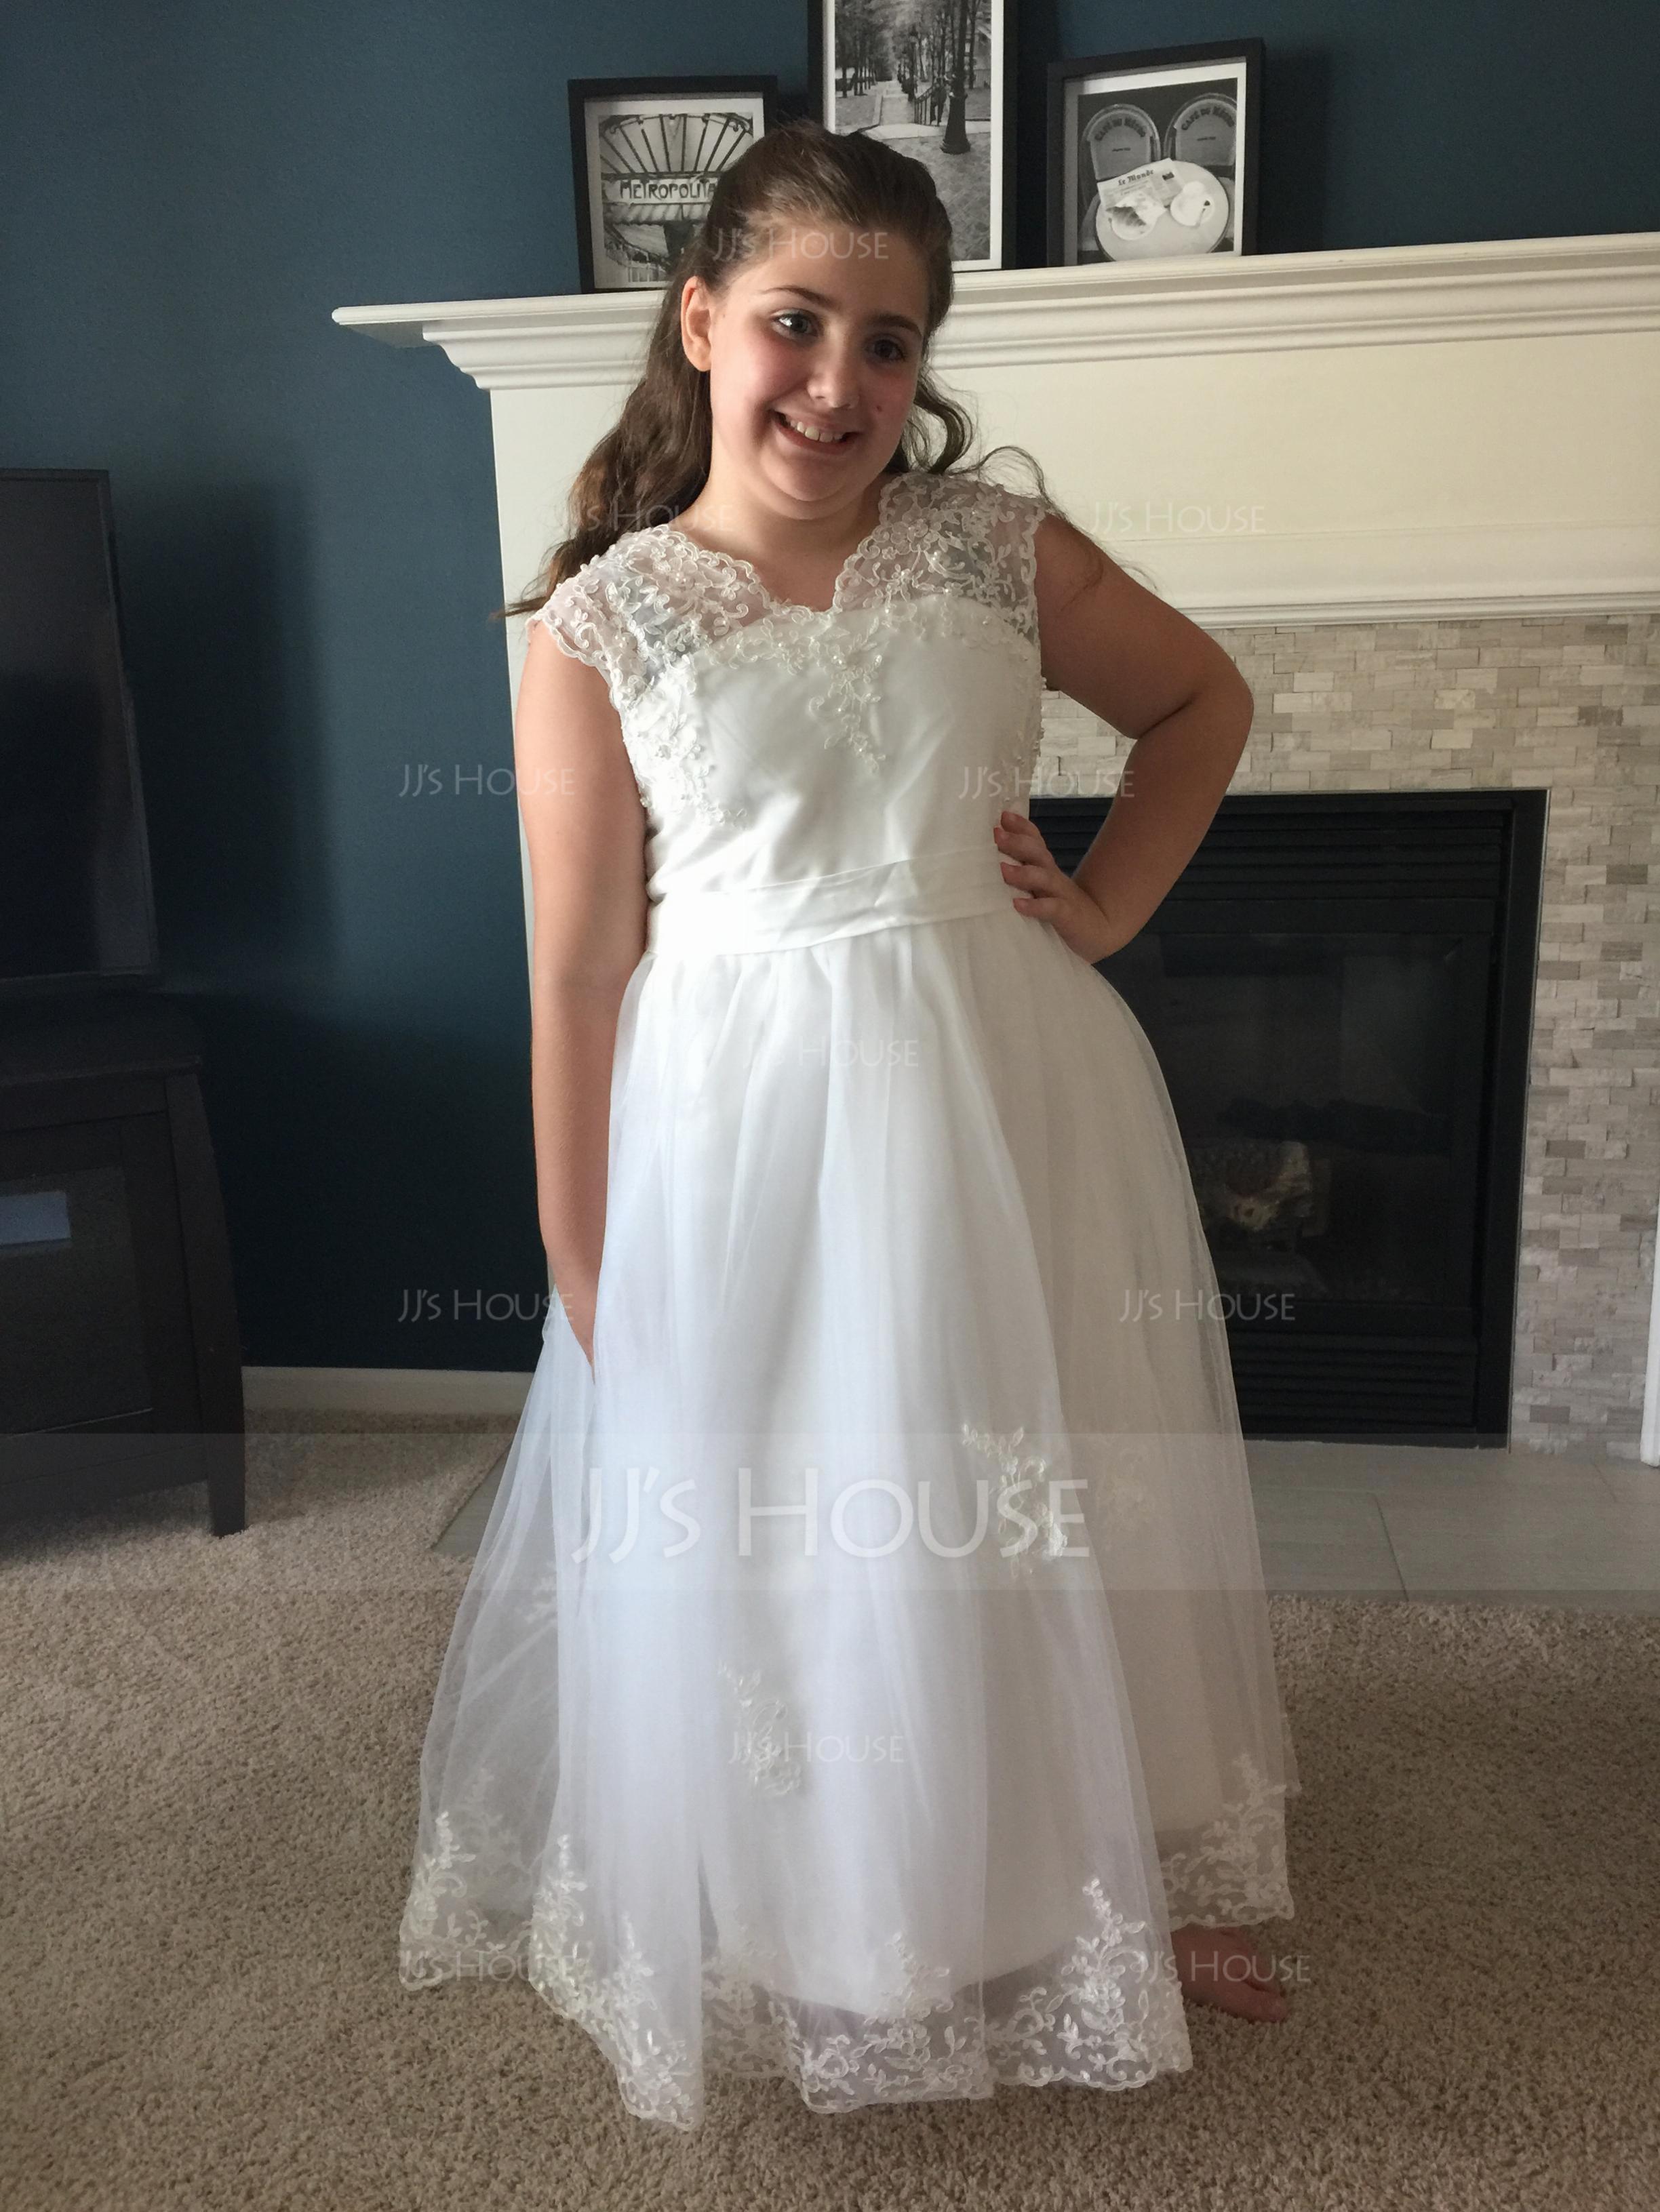 A-Line/Princess V-neck Floor-Length Tulle Junior Bridesmaid Dress With Sash (009136429)